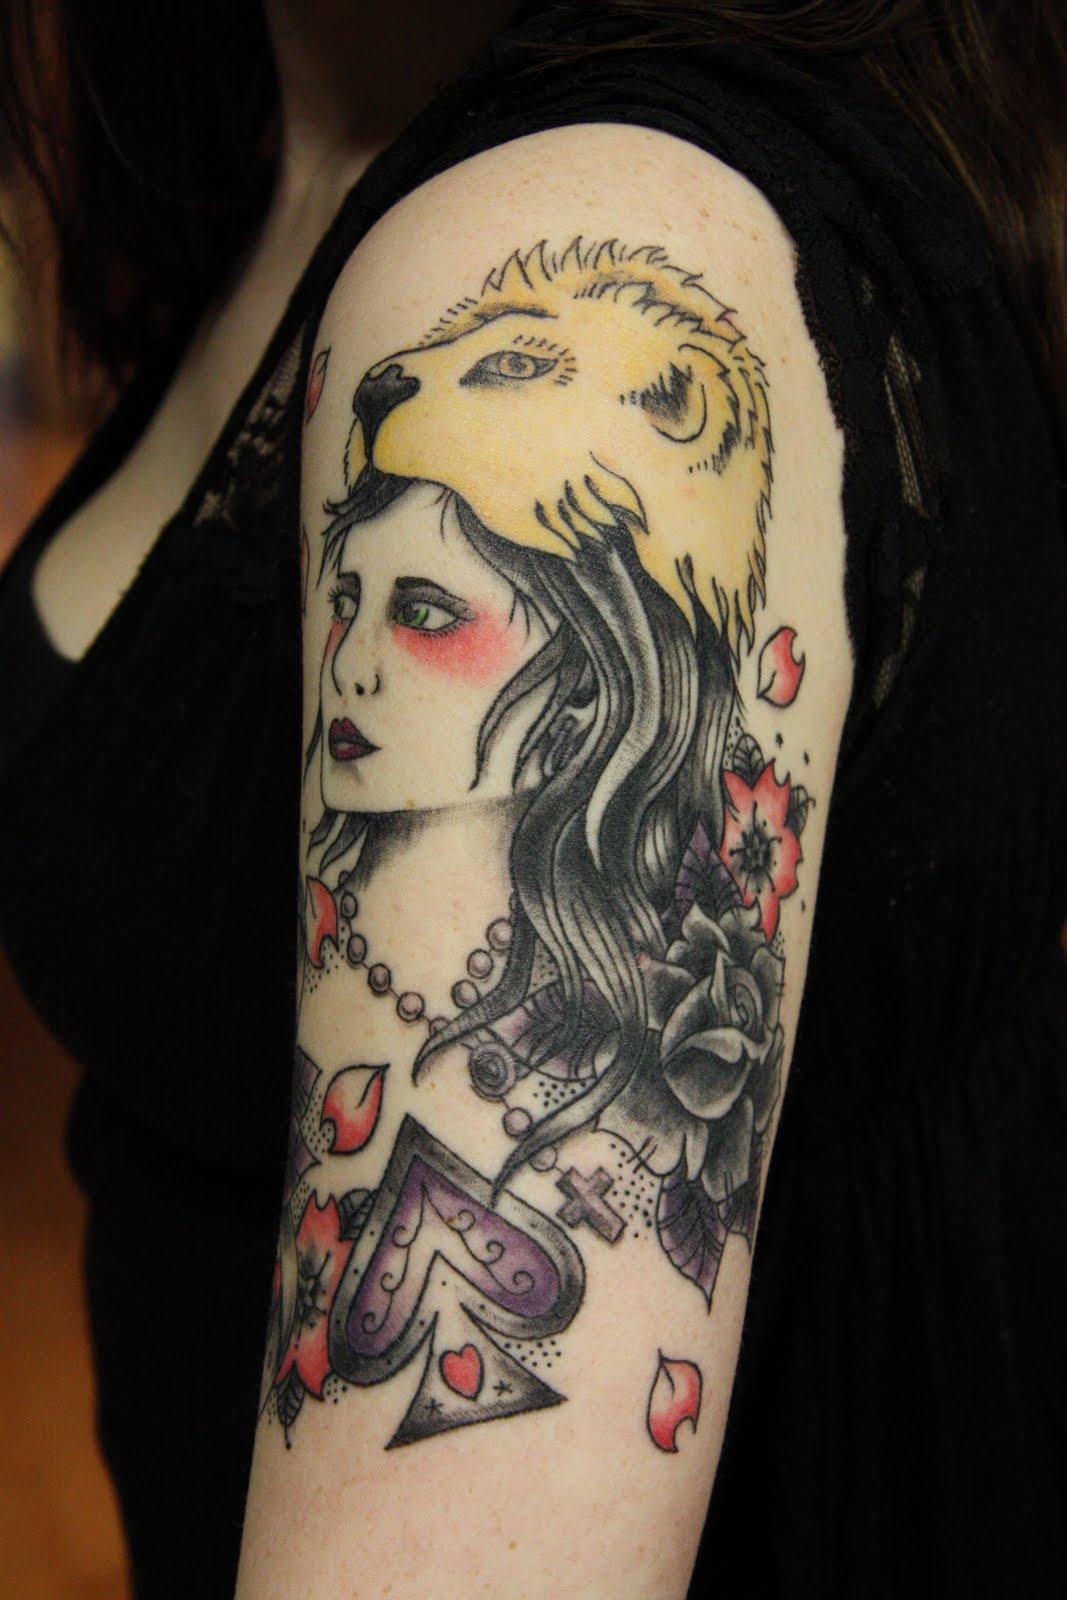 pin kat scarlet tattoos tattoo portfolio on pinterest. Black Bedroom Furniture Sets. Home Design Ideas